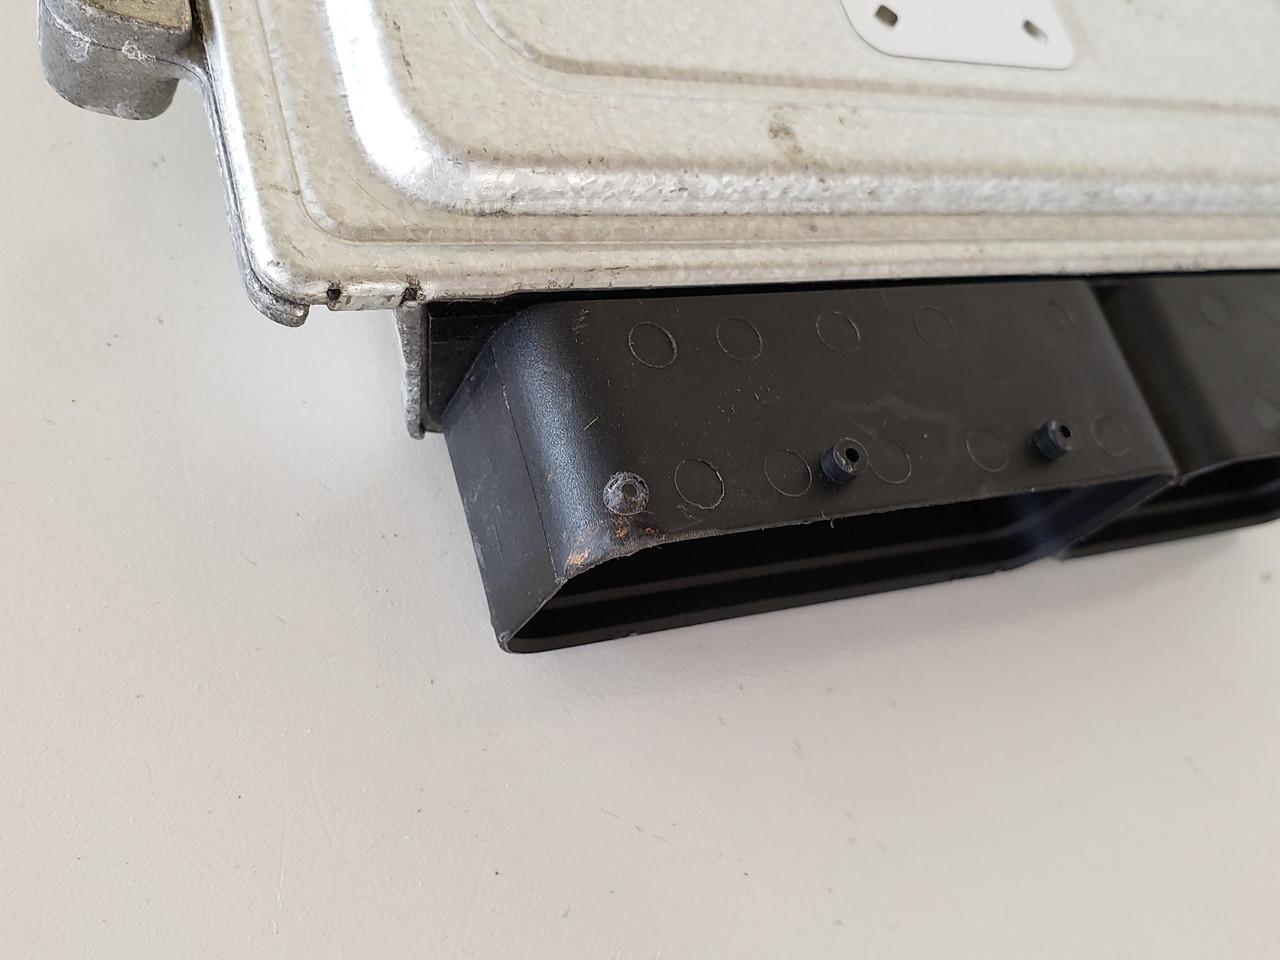 2011-2013 Sorento 39103-2G120 Computer Brain Engine Control ECU ECM EBX Module